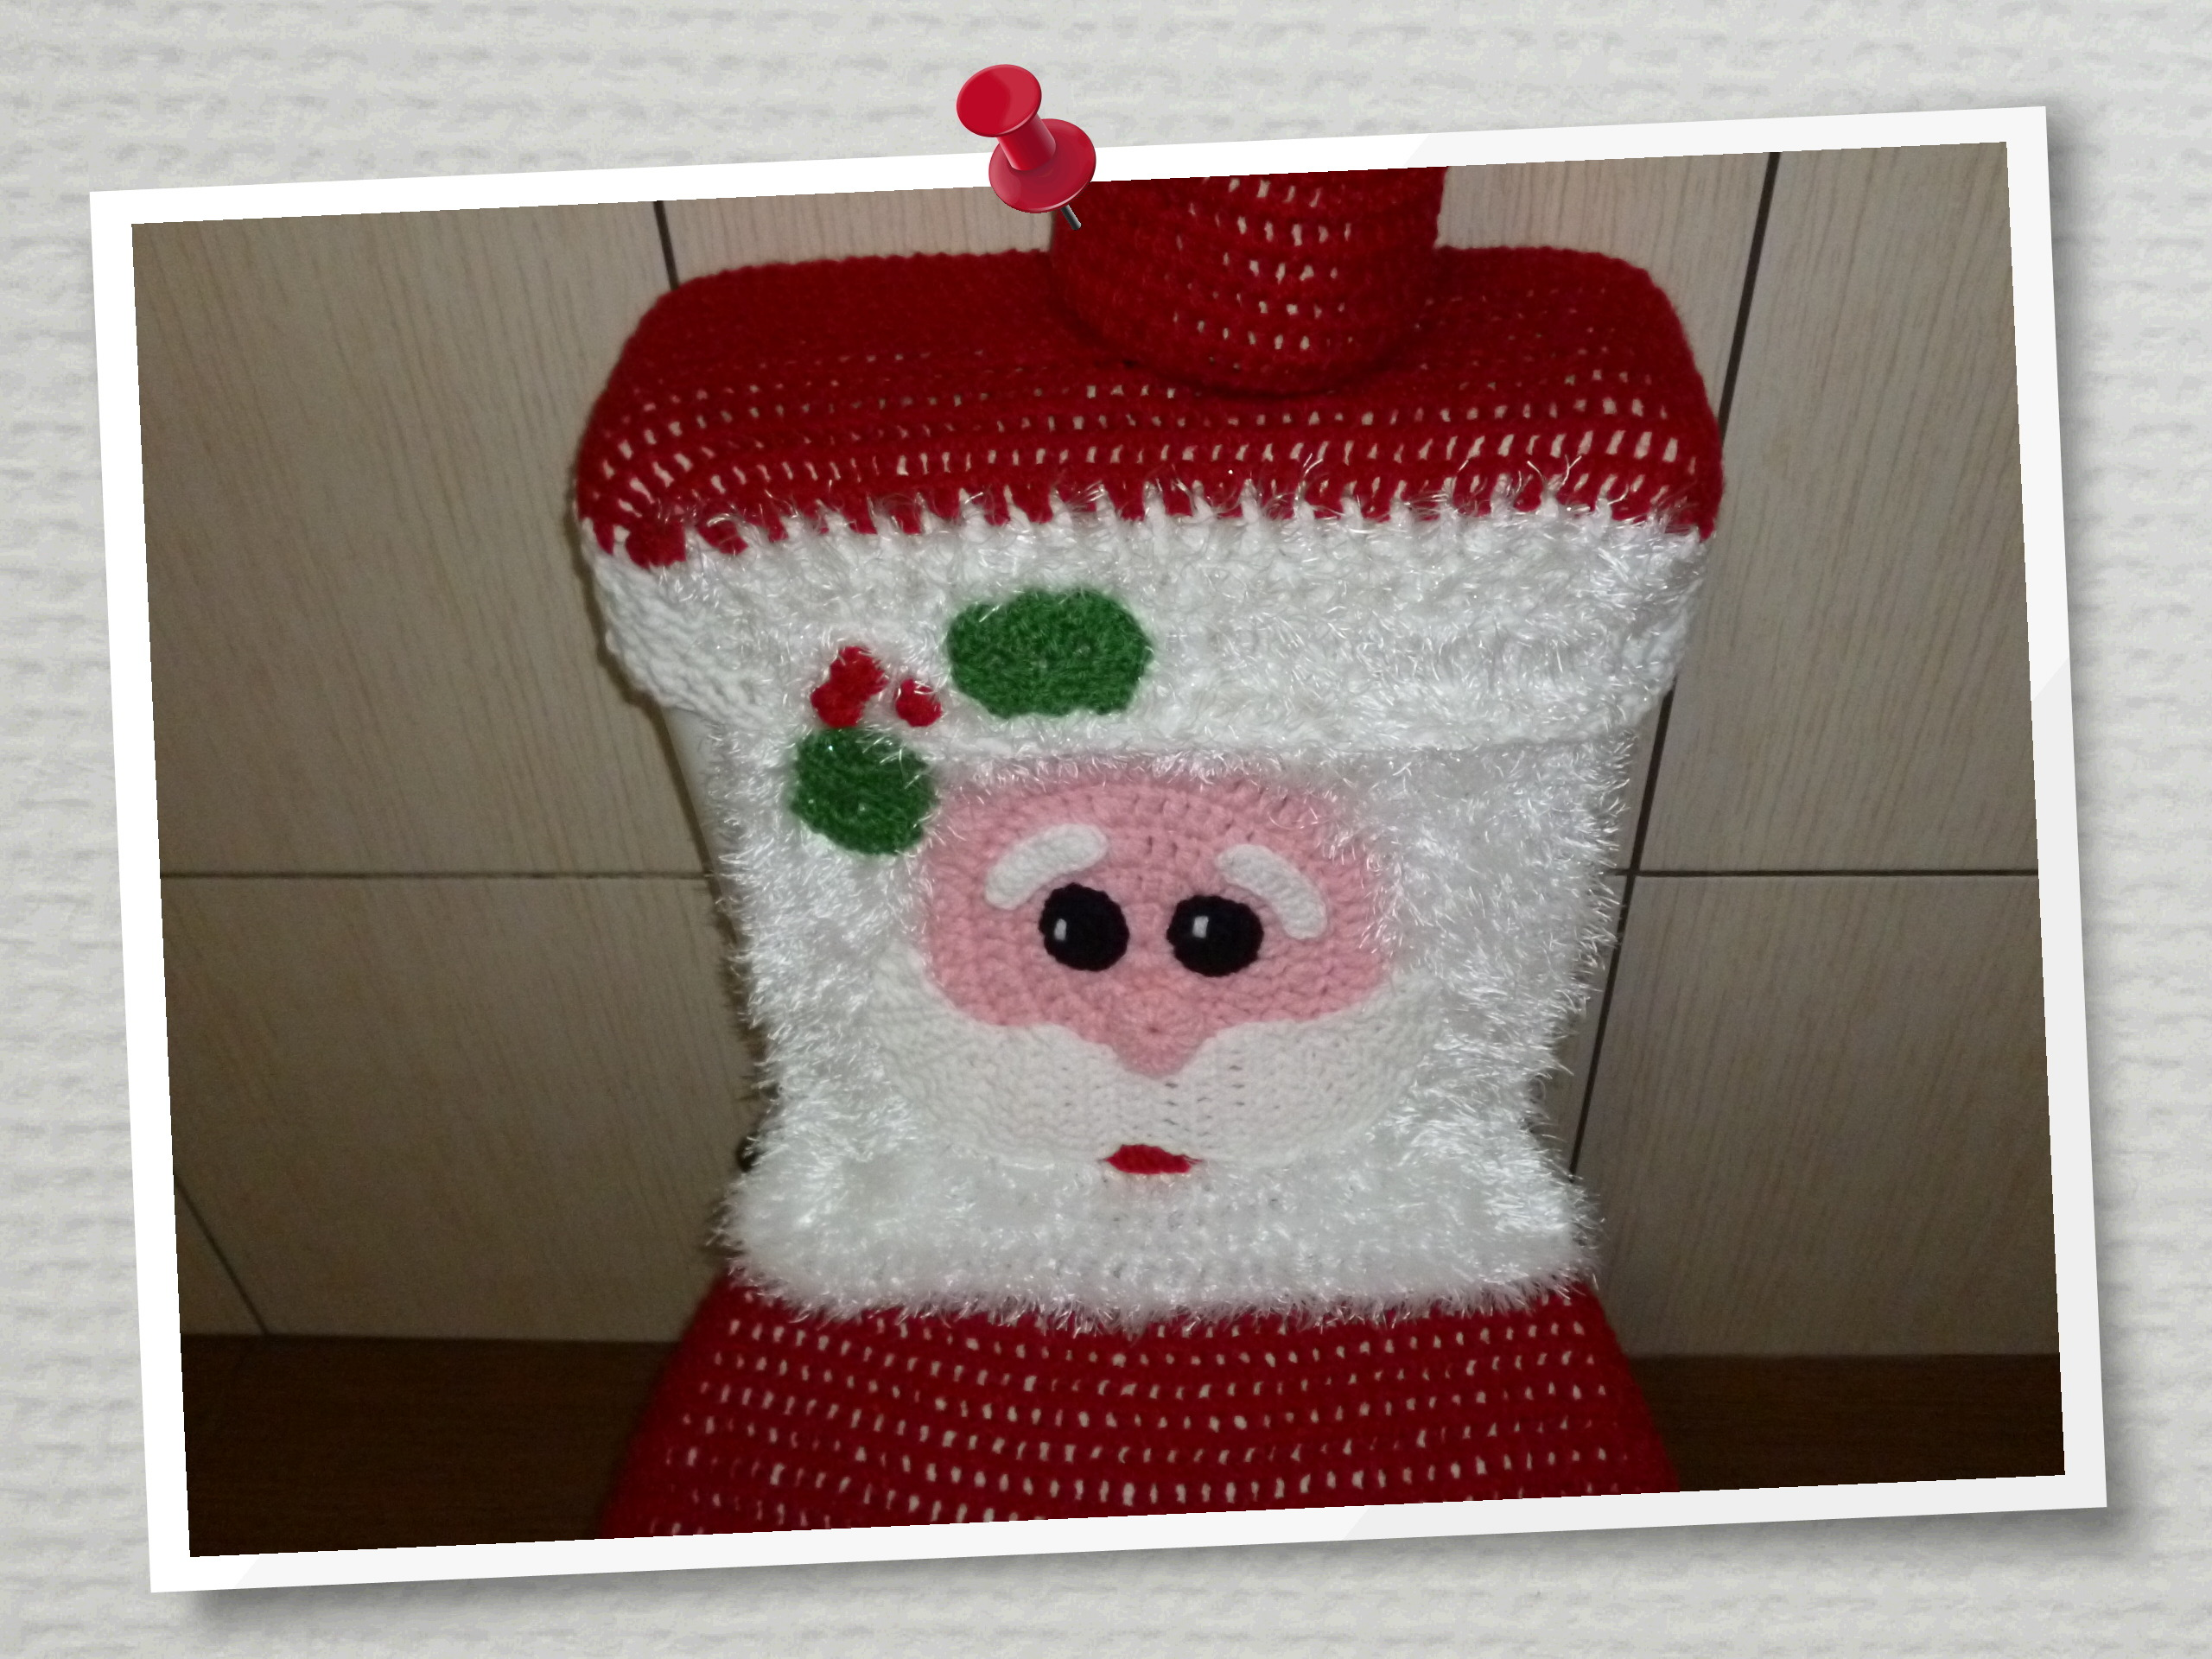 #621D1C conjunto de banheiro papai noel conjunto de banheiro papai noel  2560x1920 px Banheiro Entupido Com Papel Higienico 3197